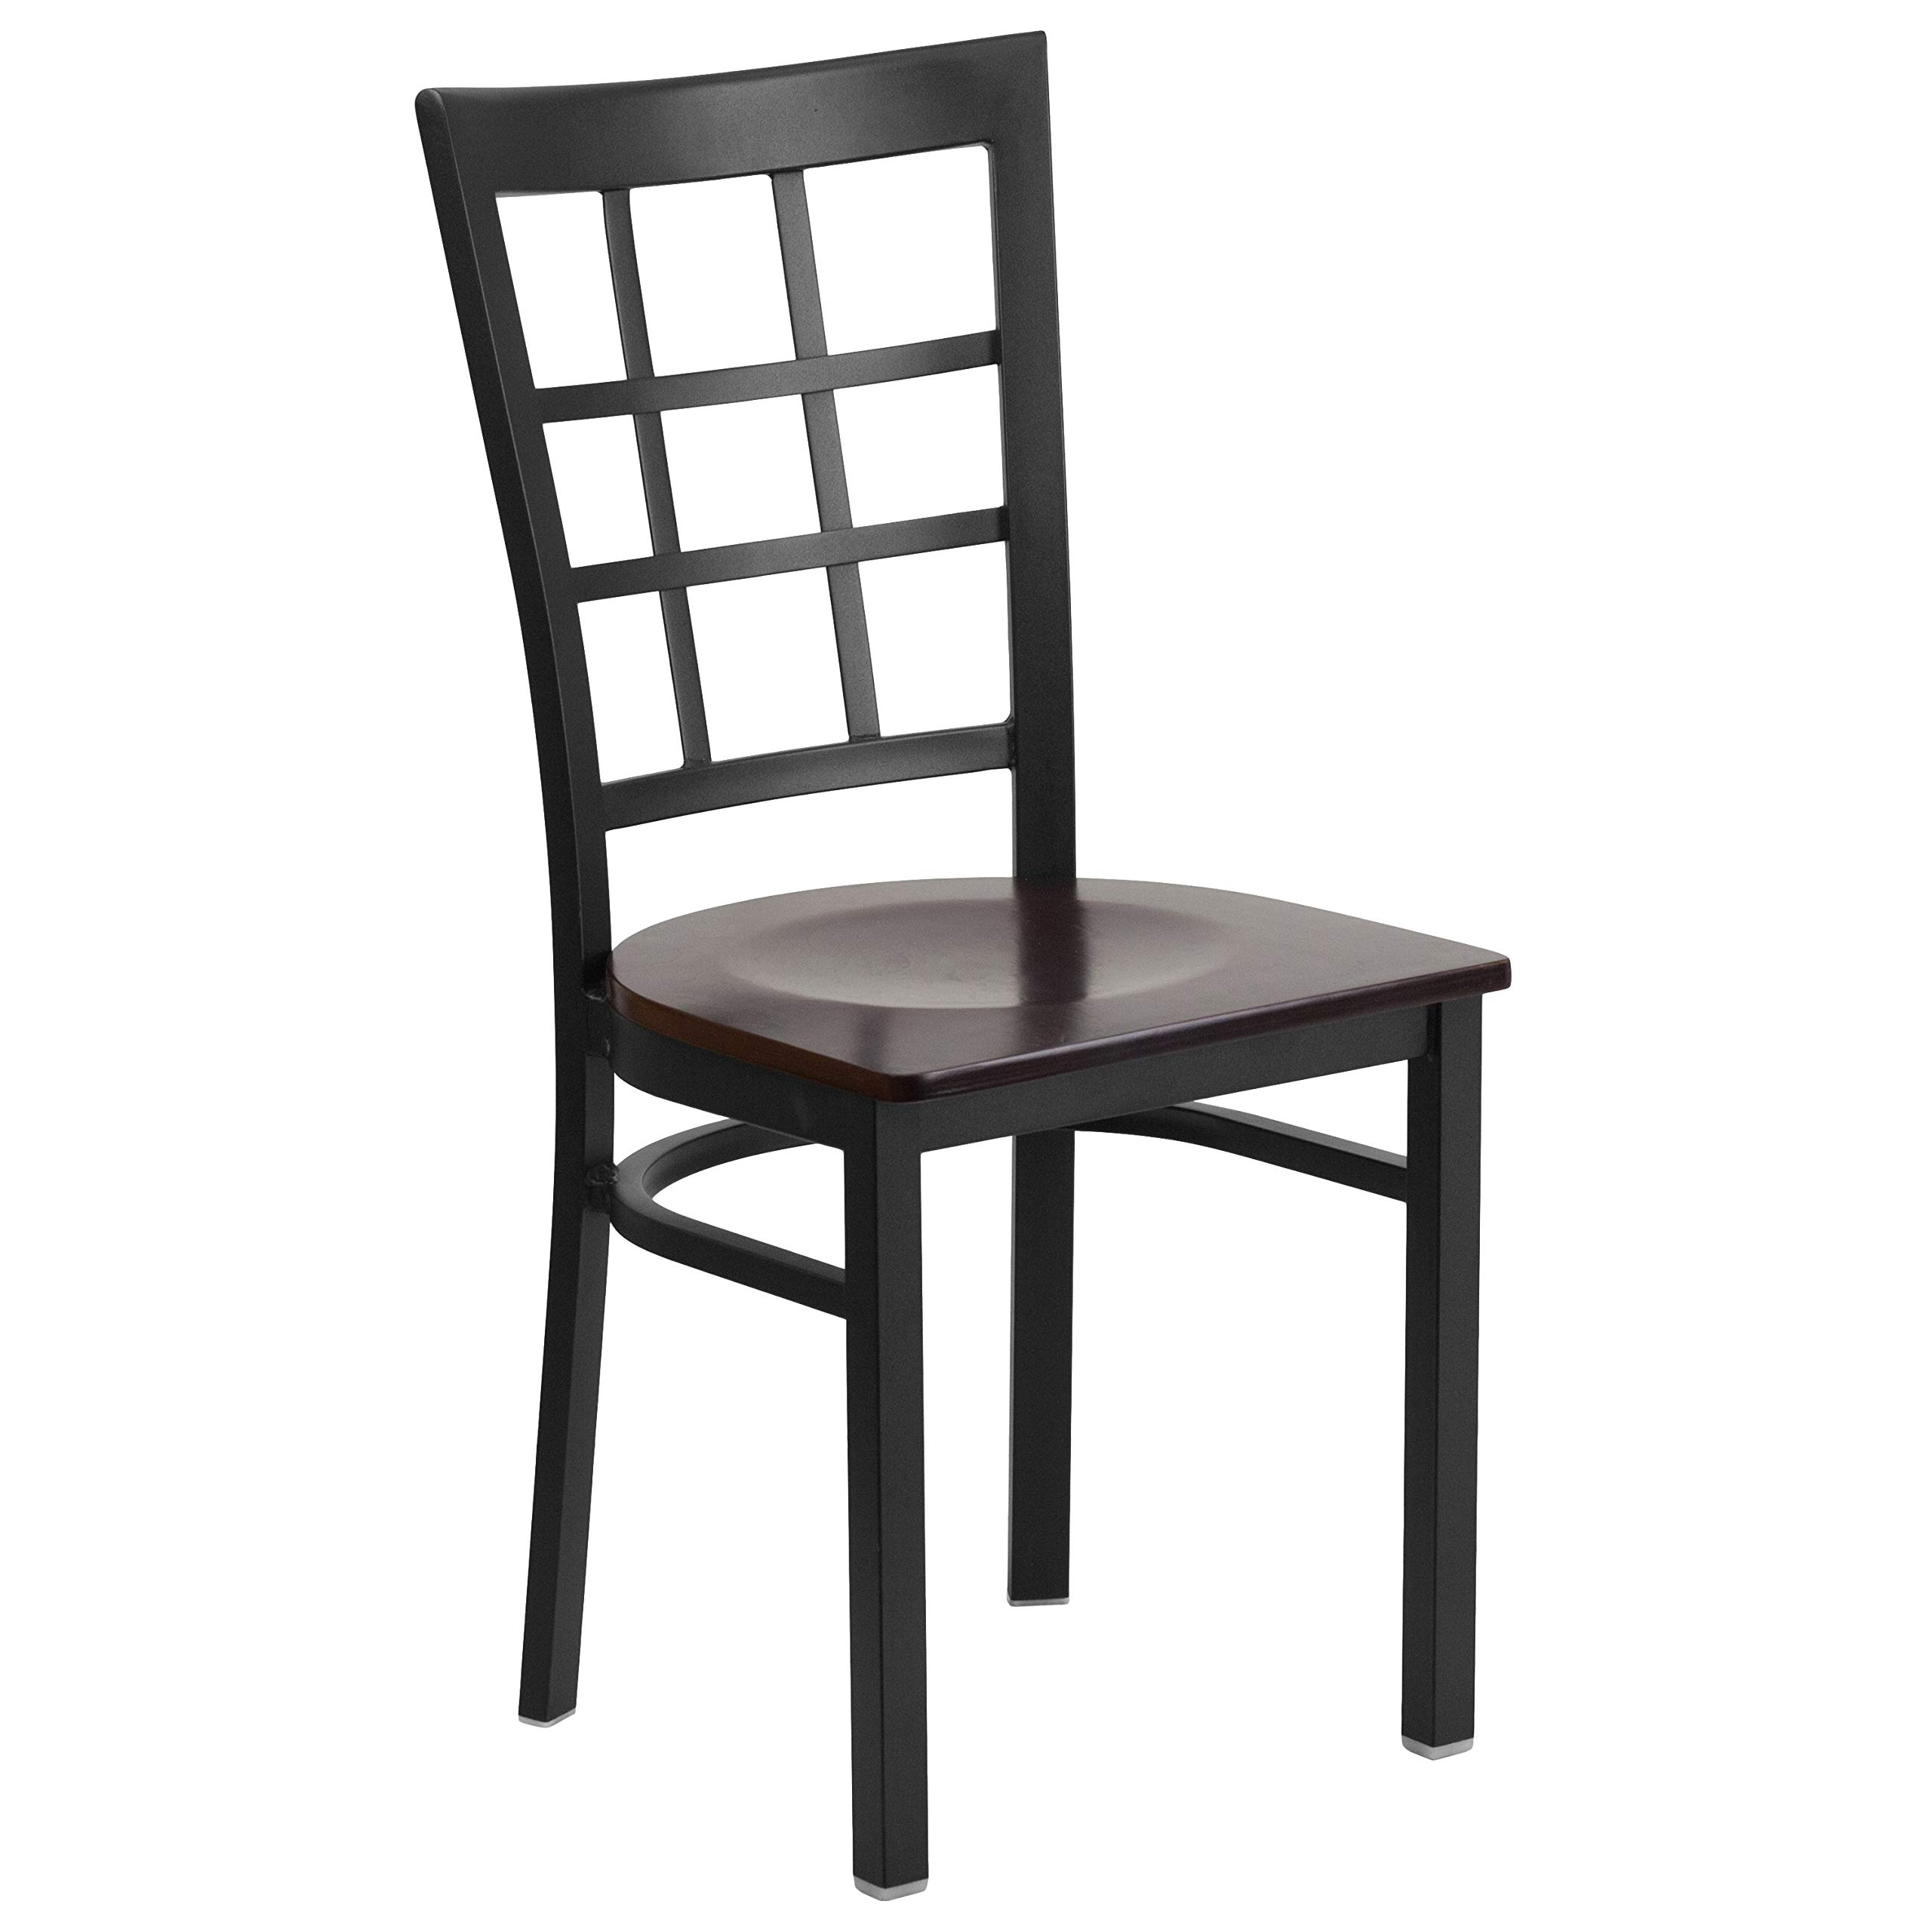 MFO Princeton Collection Black Window Back Metal Restaurant Chair - Walnut Wood Seat